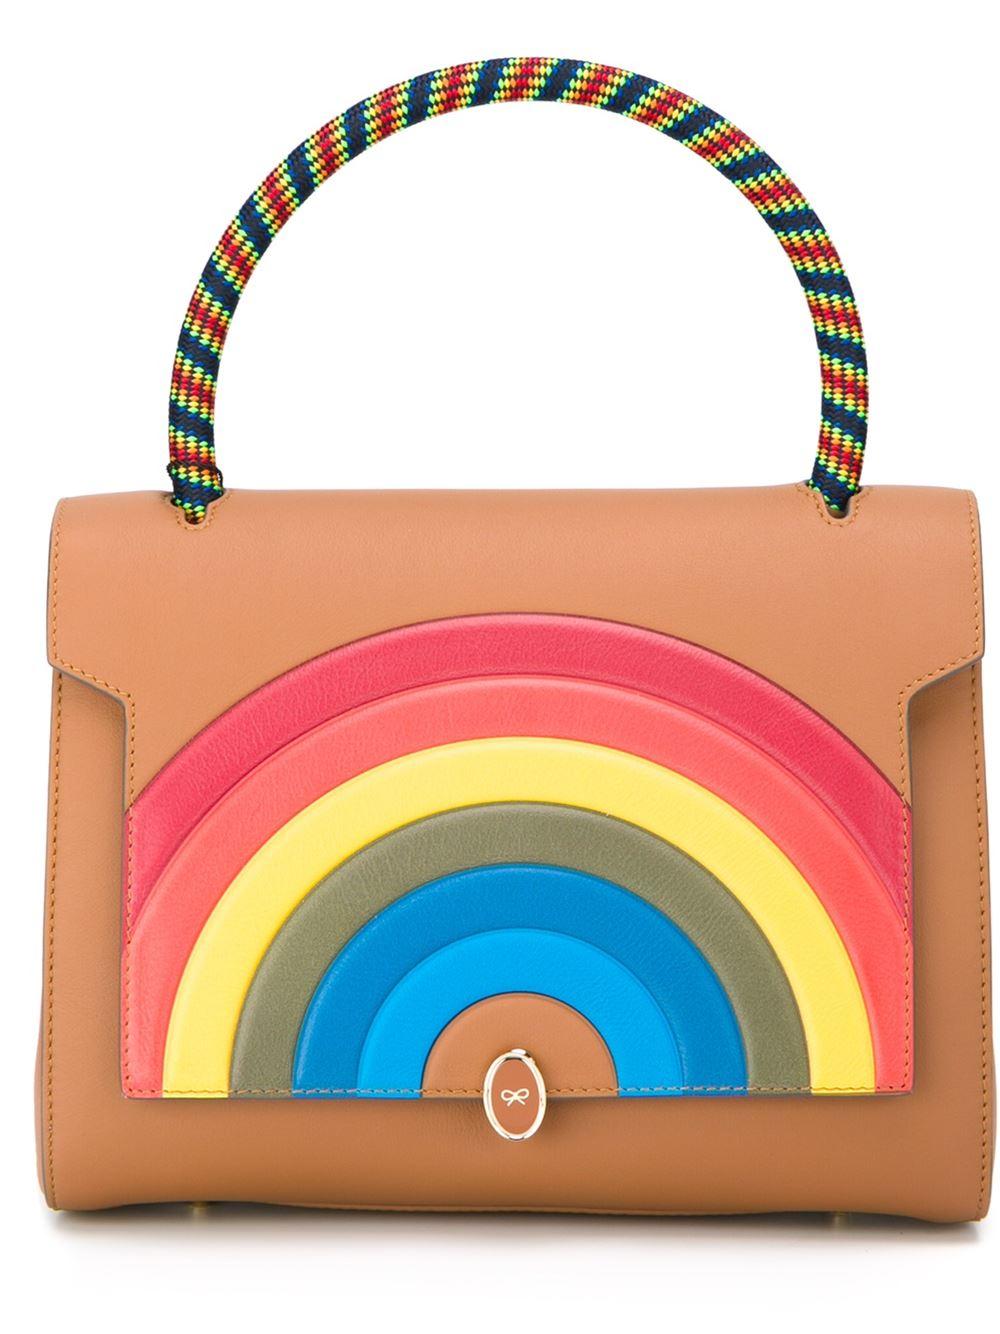 Anya rainbow bag.jpg